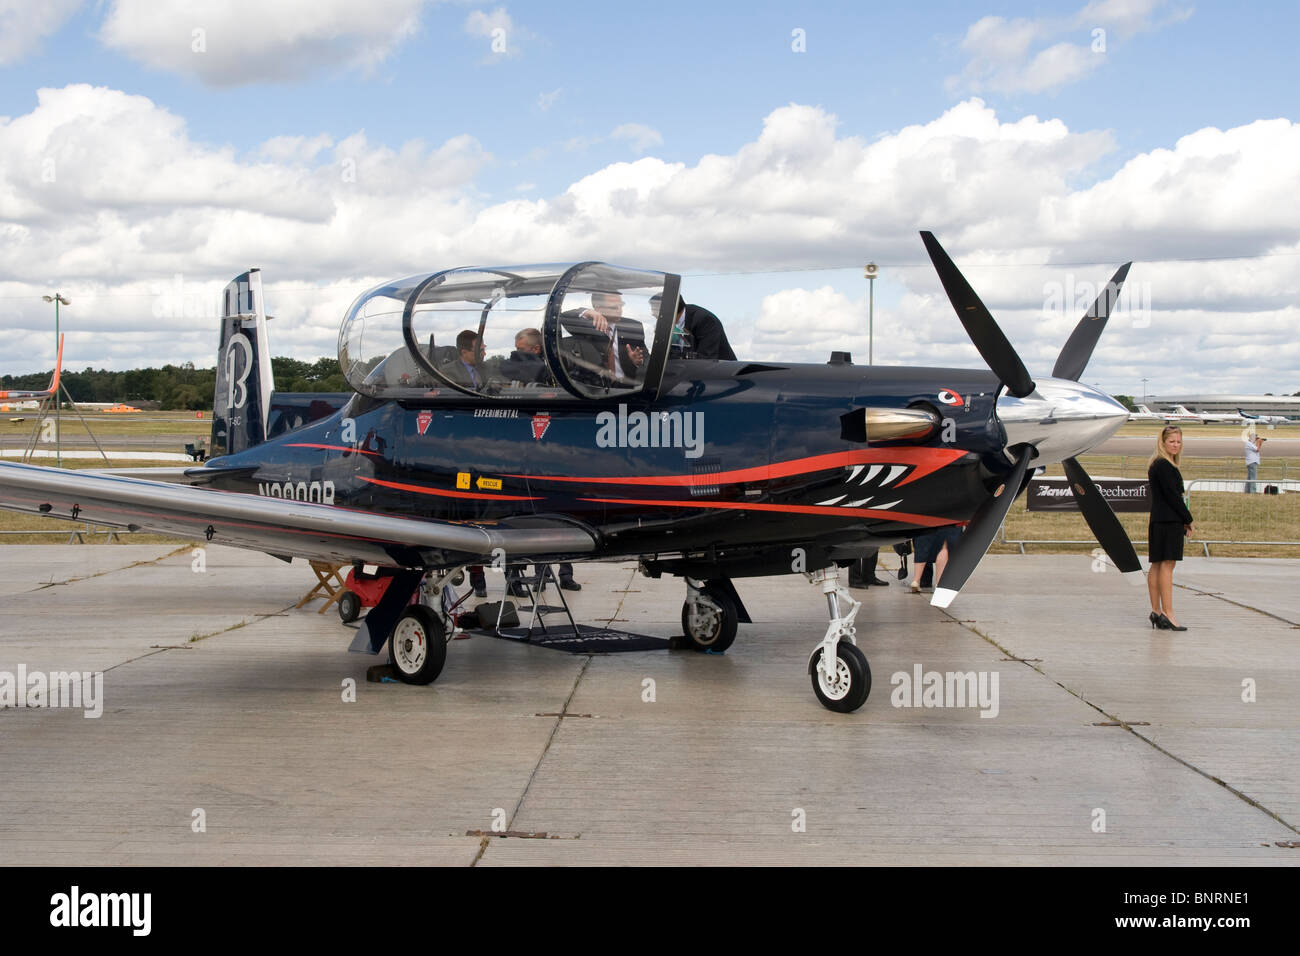 Raytheon T6 Texan 2 training aircraft at Farnborough International Air Show 2010 Great Britain - Stock Image